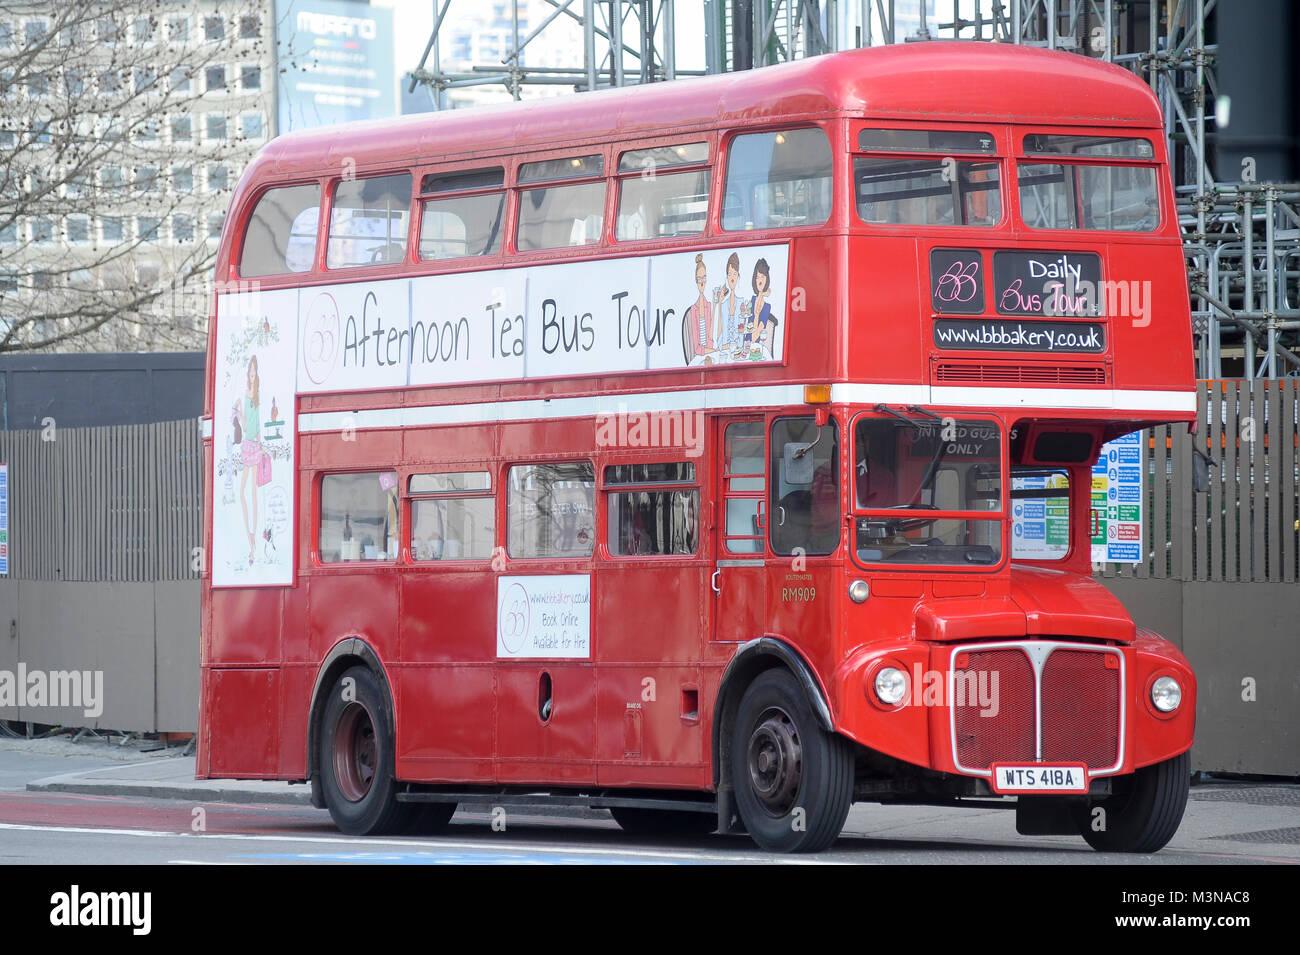 AEC Routemaster in London, England, United Kingdom. April 5th 2015 © Wojciech Strozyk / Alamy Stock Photo - Stock Image